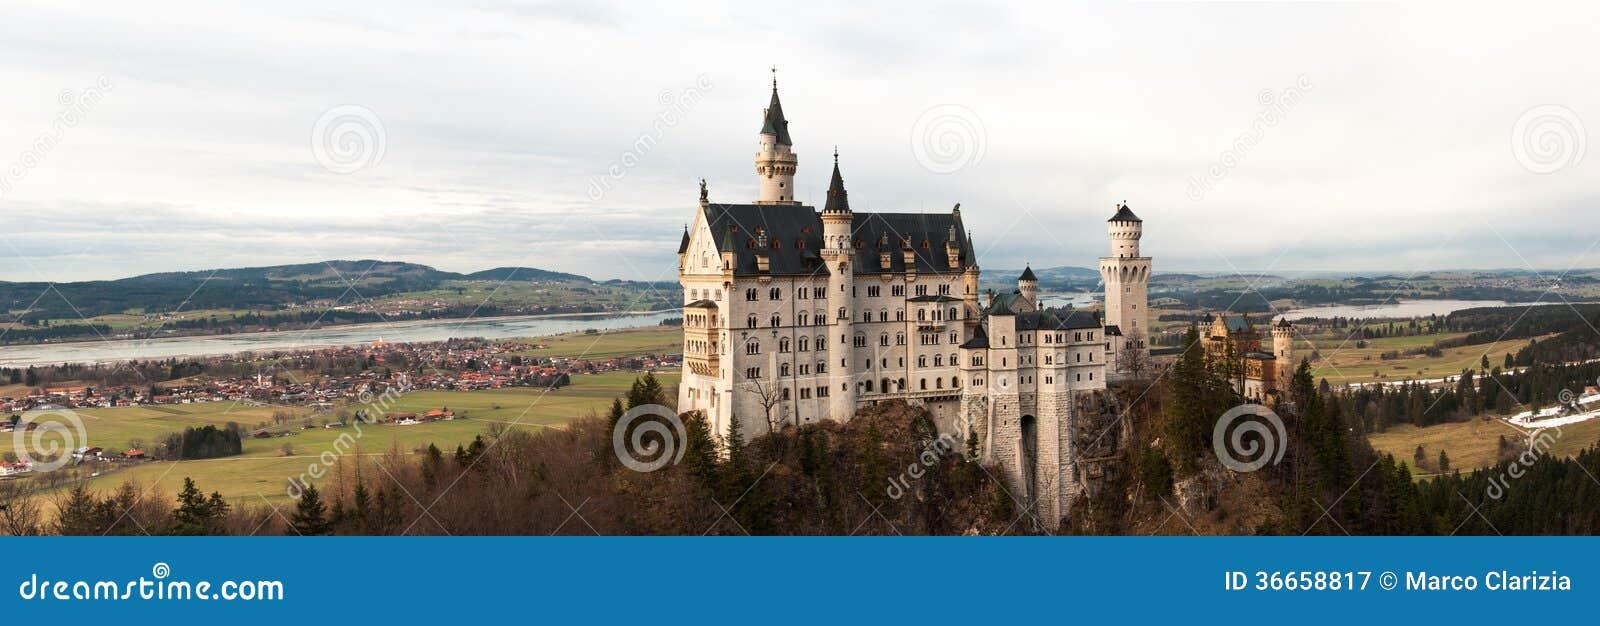 Neuschwanstein Castle Panoramic Stock Image Image Of